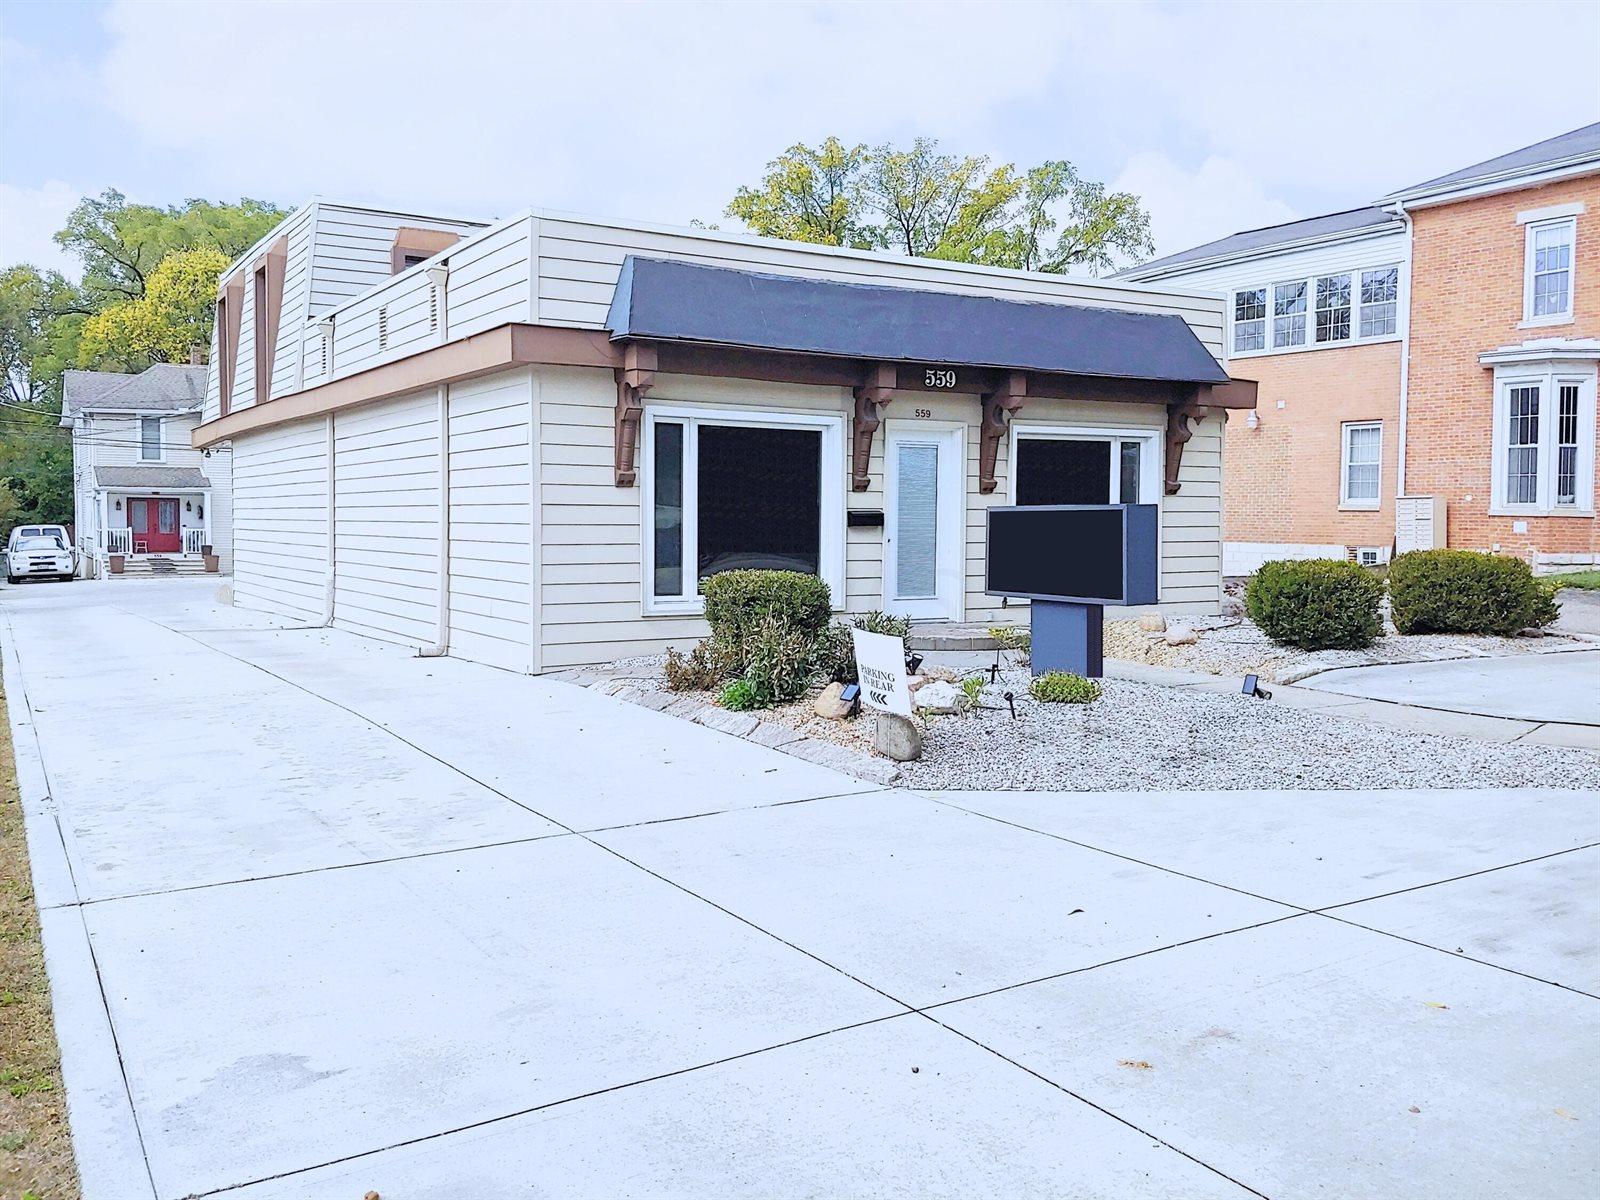 559 High Street, Worthington, OH 43085